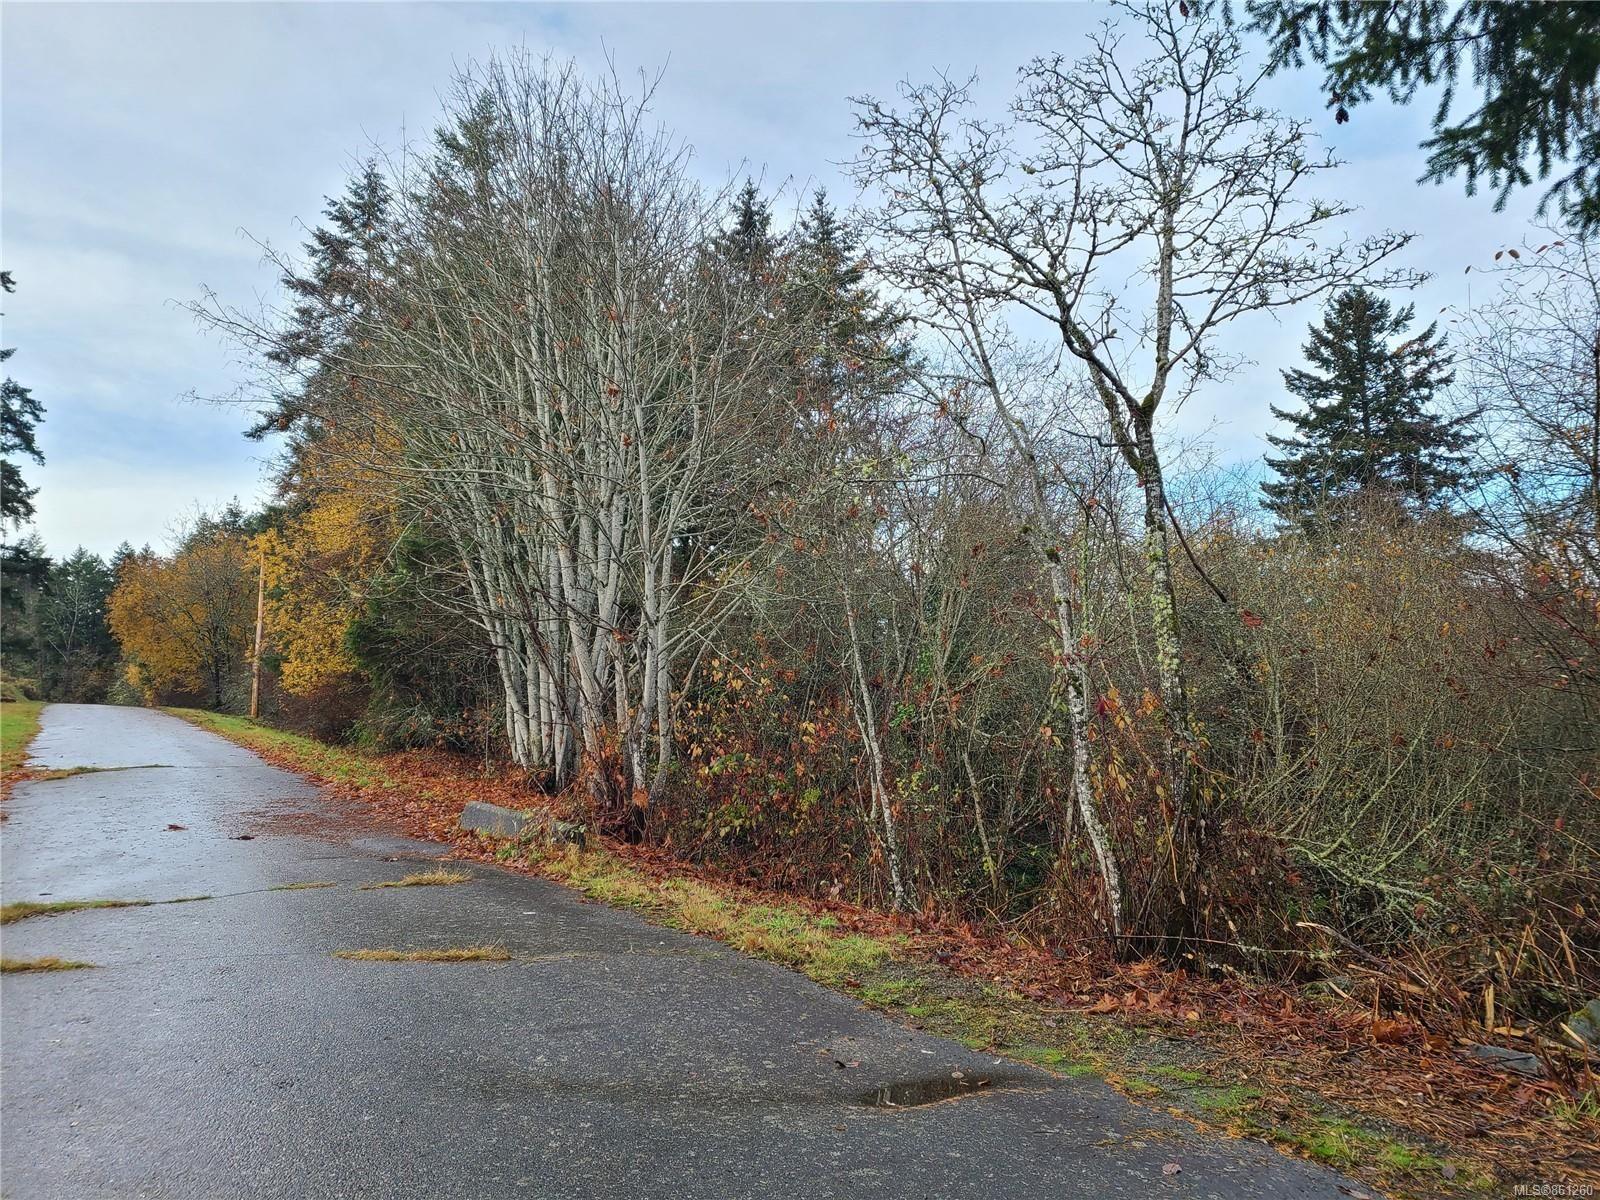 Photo 17: Photos: LT 2 2245 Moose Rd in : Du East Duncan Multi Family for sale (Duncan)  : MLS®# 861260